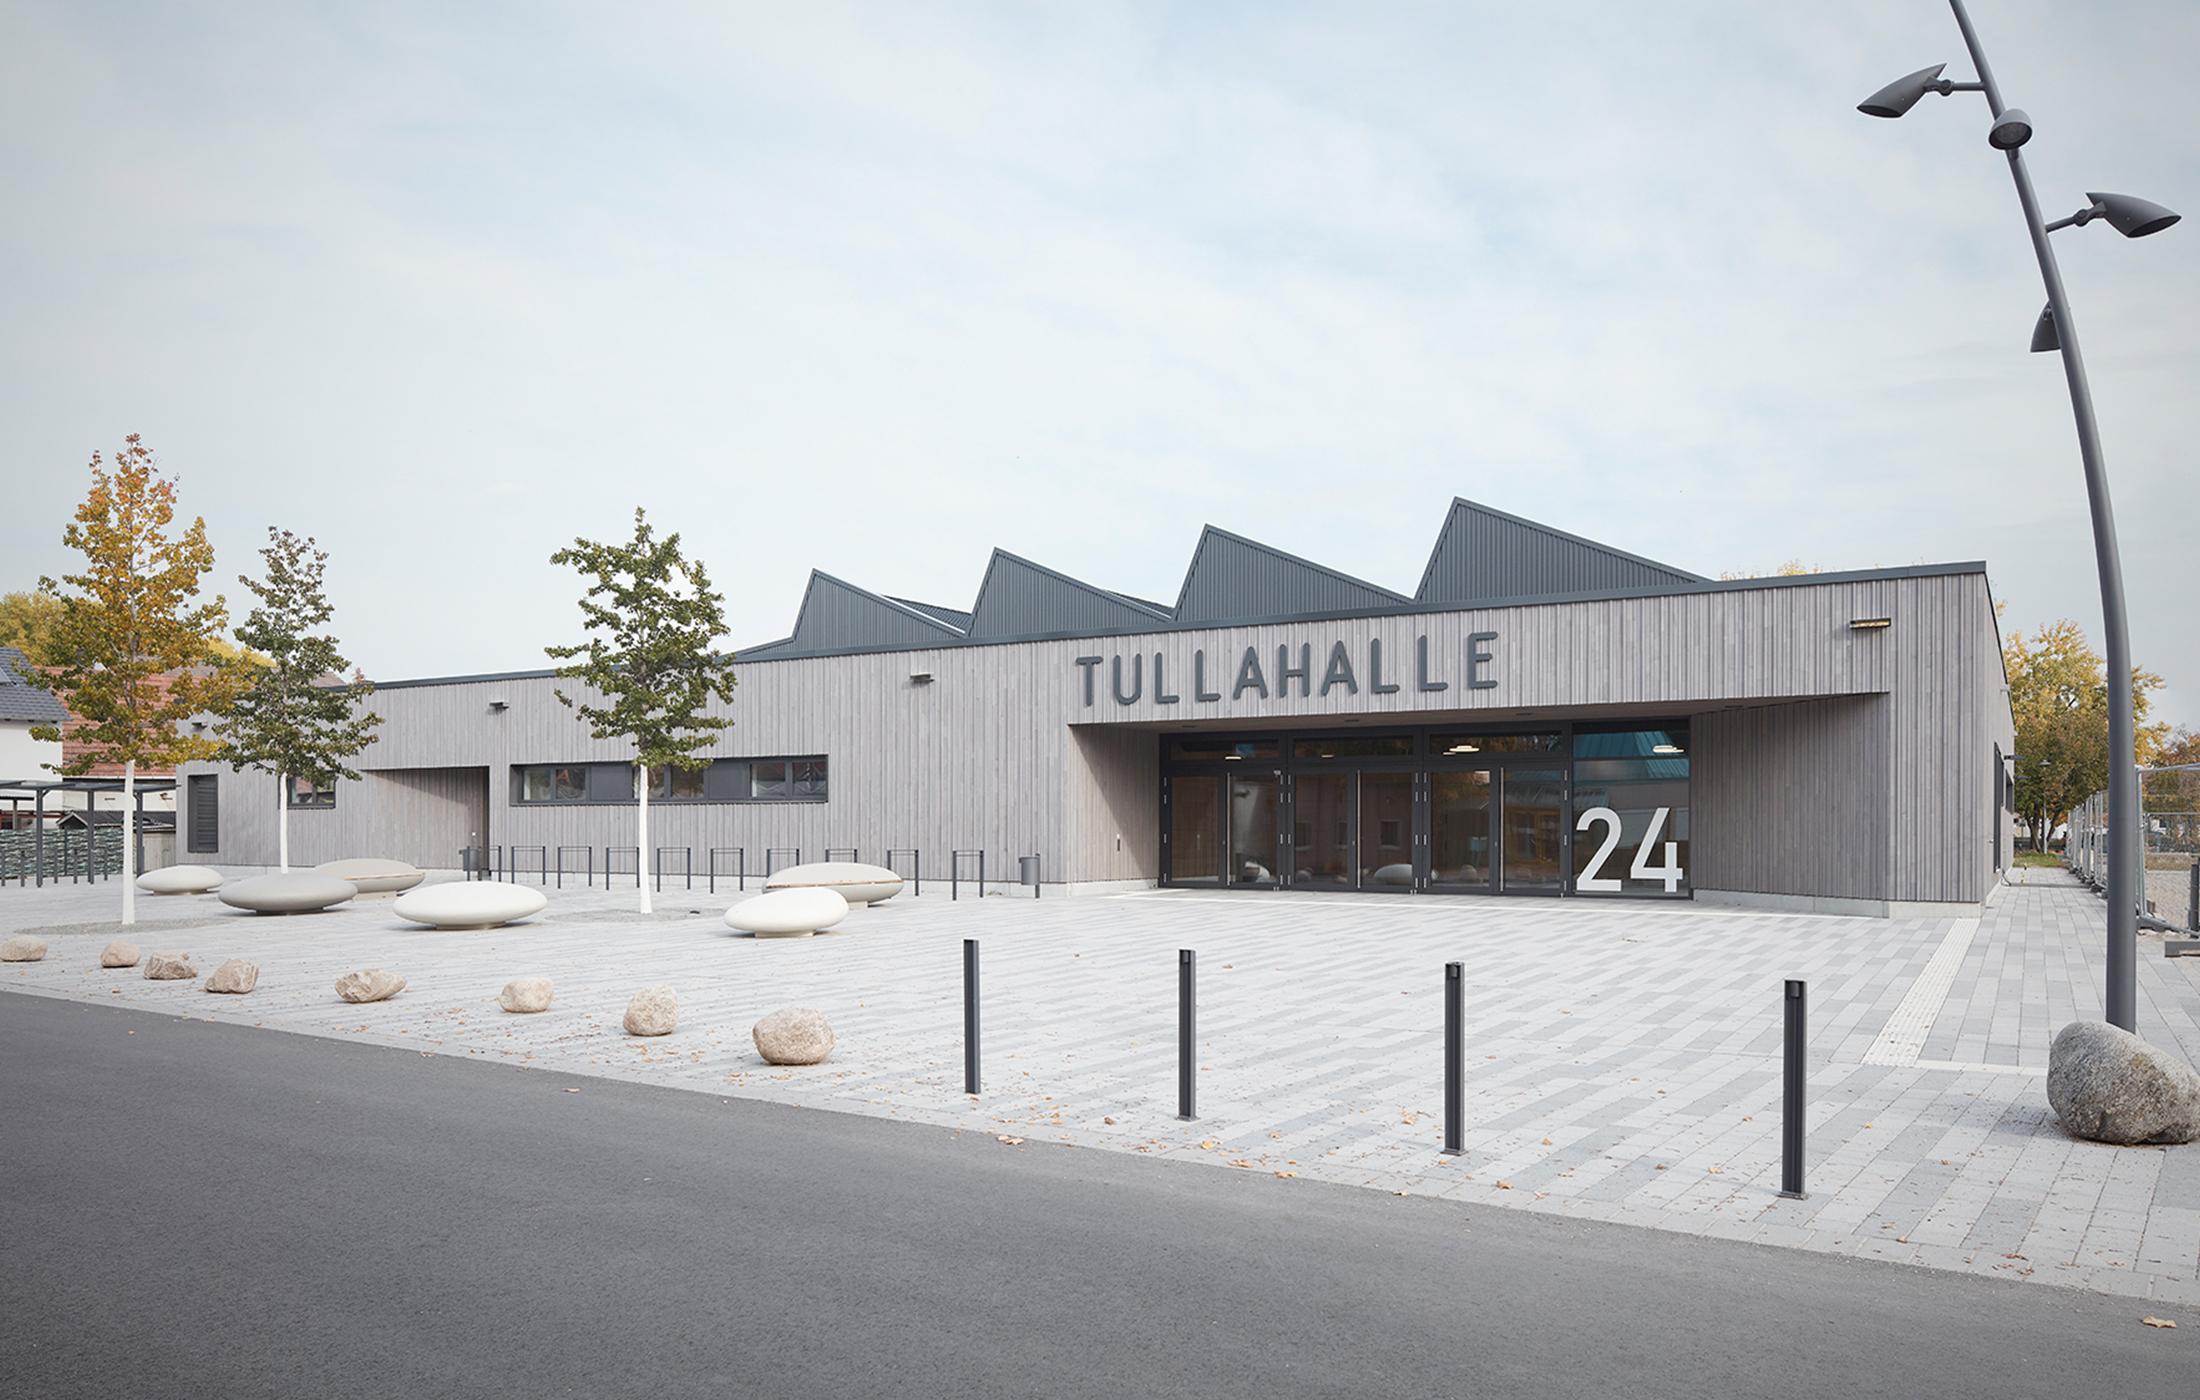 2020, Neubau Tullahalle, Rheinhausen Oberhausen